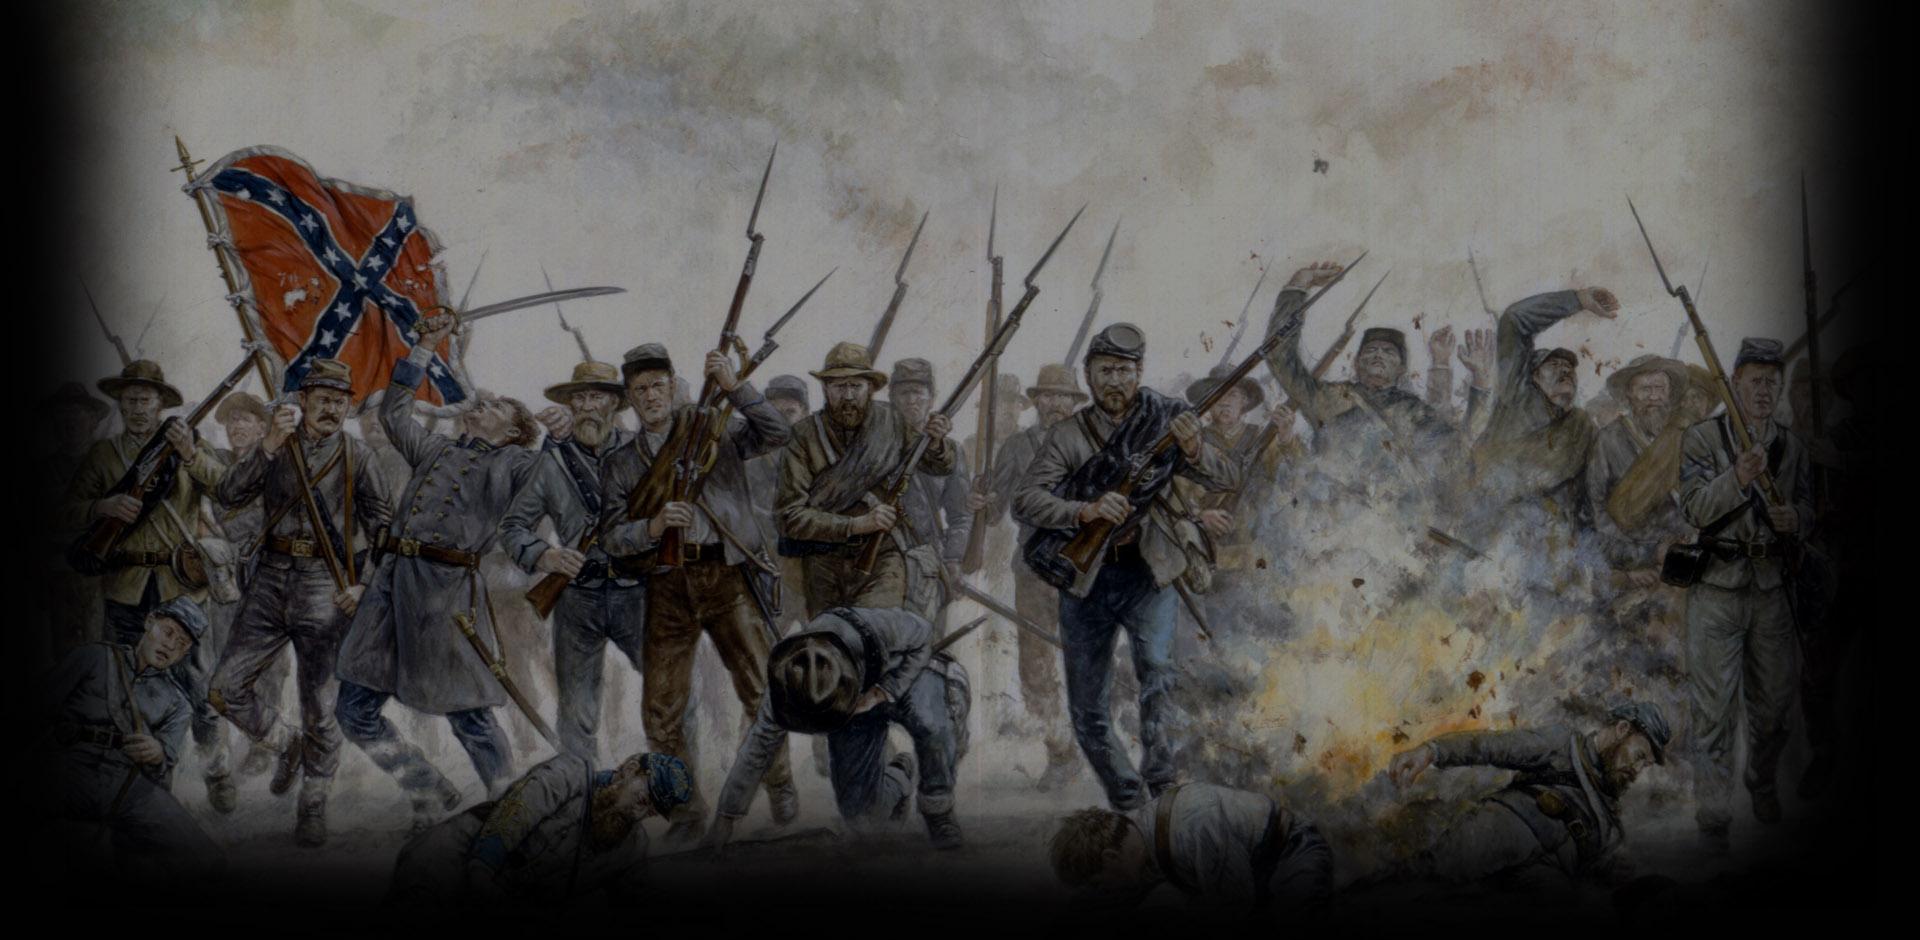 Union army civil war pictures 179 best